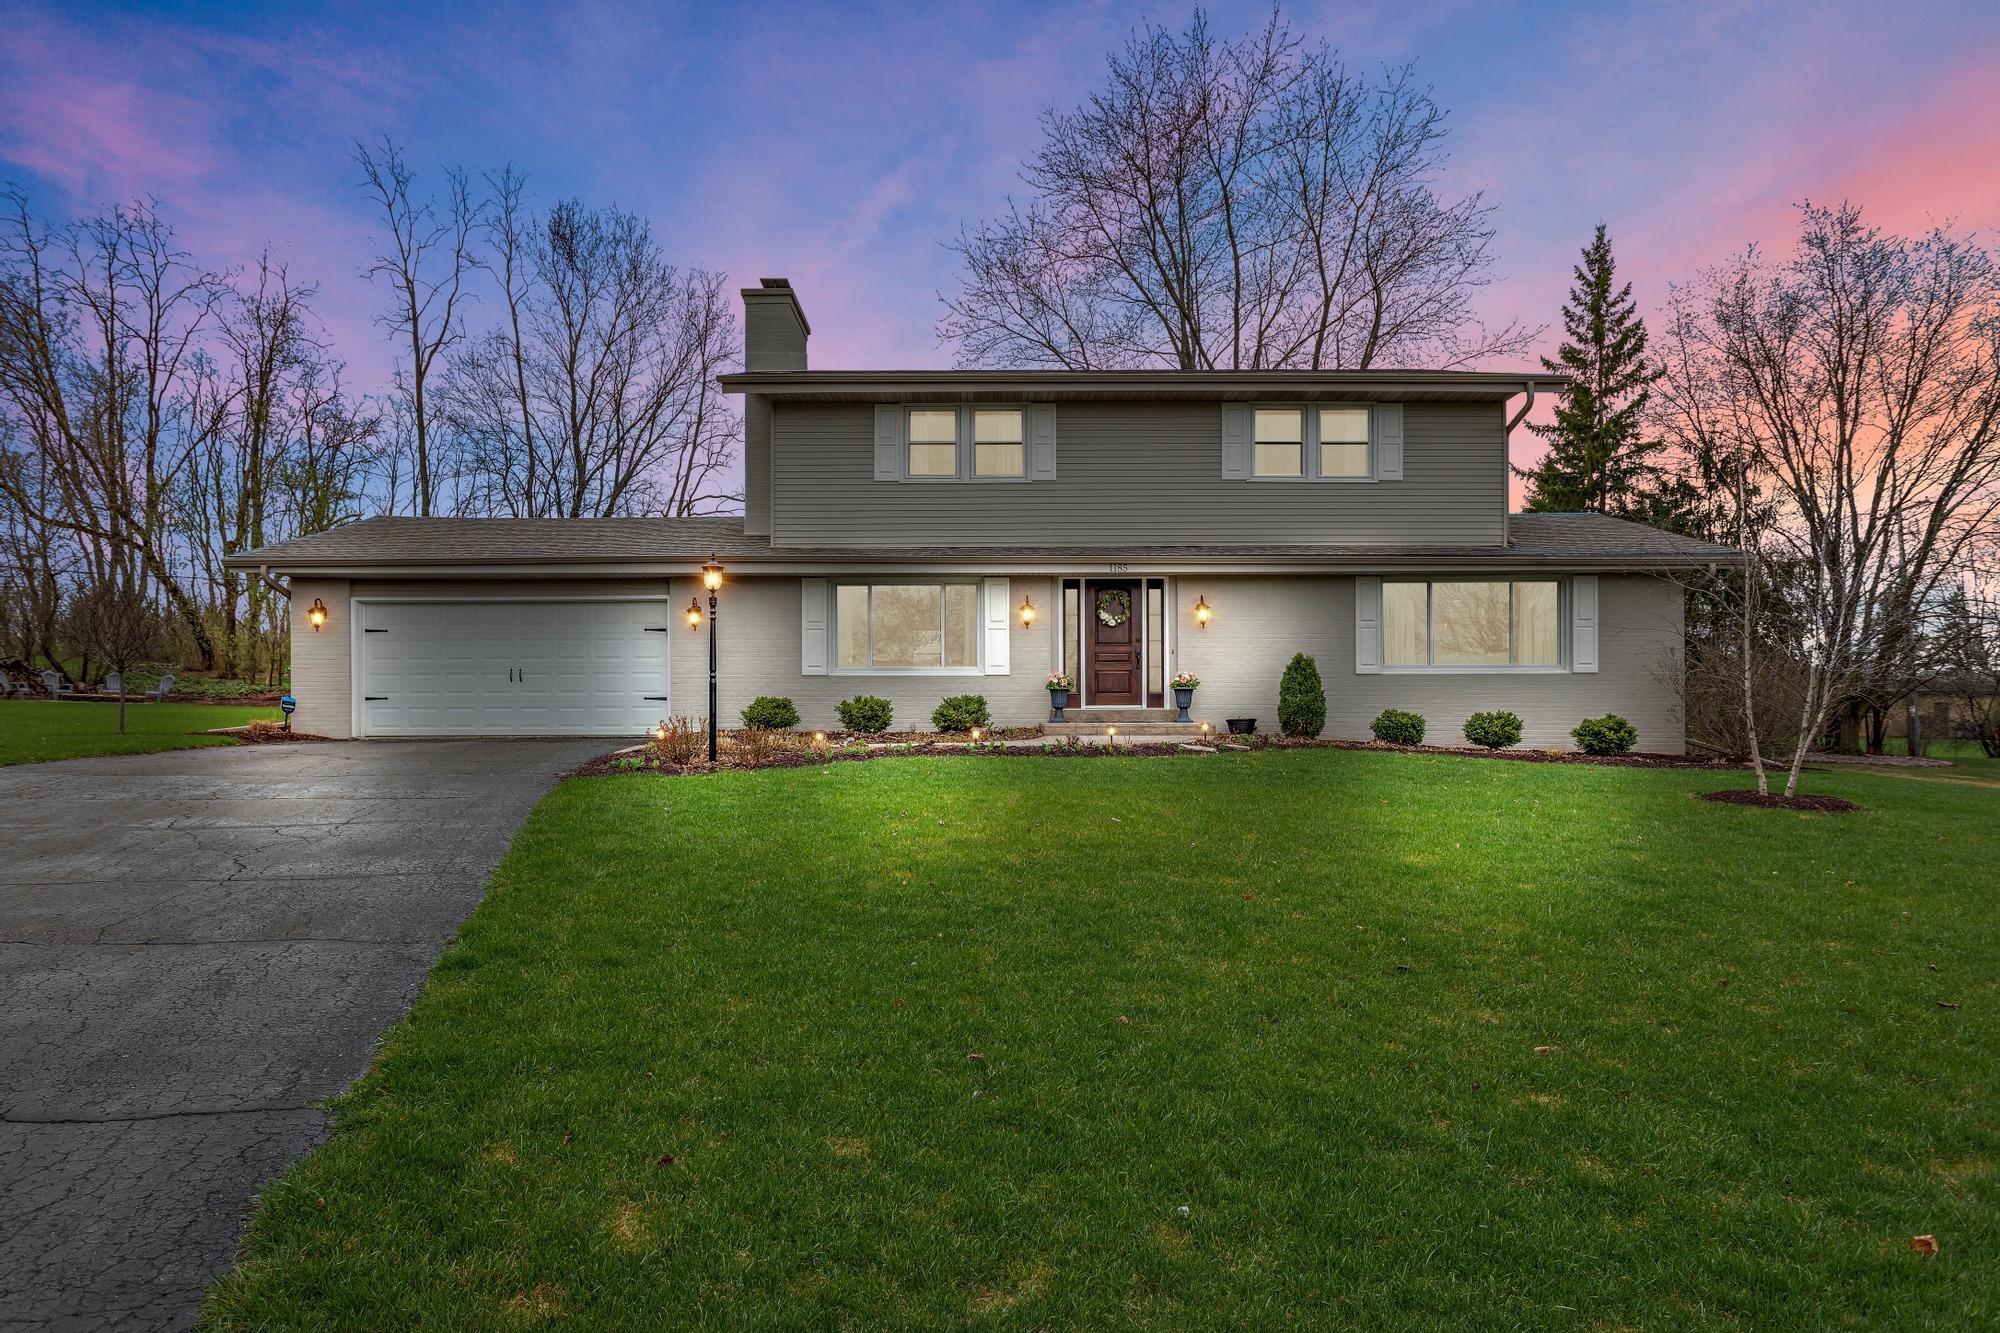 1185 Tanglewood Ct, Brookfield, Wisconsin 53005, 4 Bedrooms Bedrooms, 8 Rooms Rooms,2 BathroomsBathrooms,Single-Family,For Sale,Tanglewood Ct,1735213